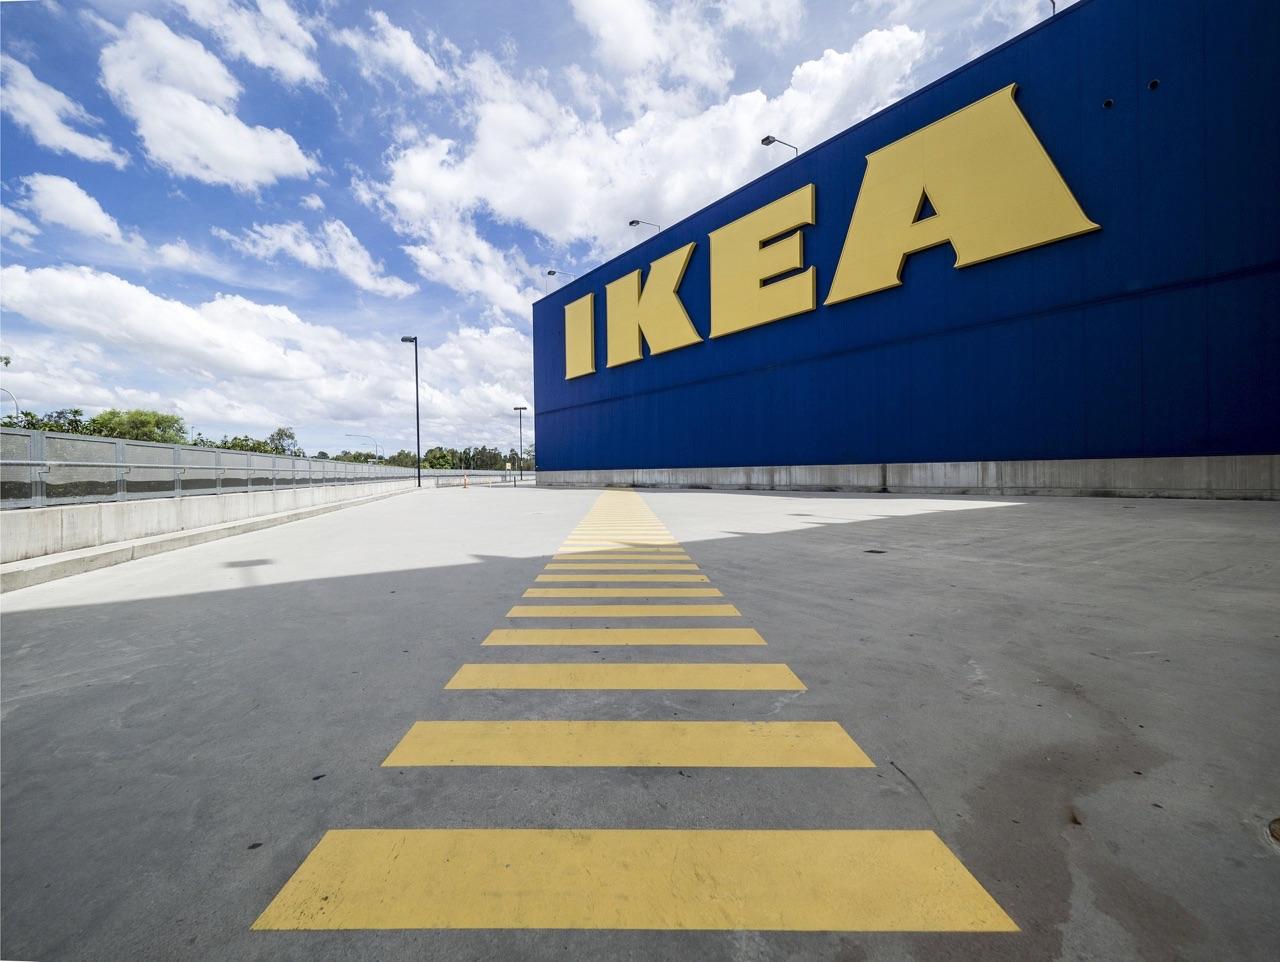 IKEA vestiging.